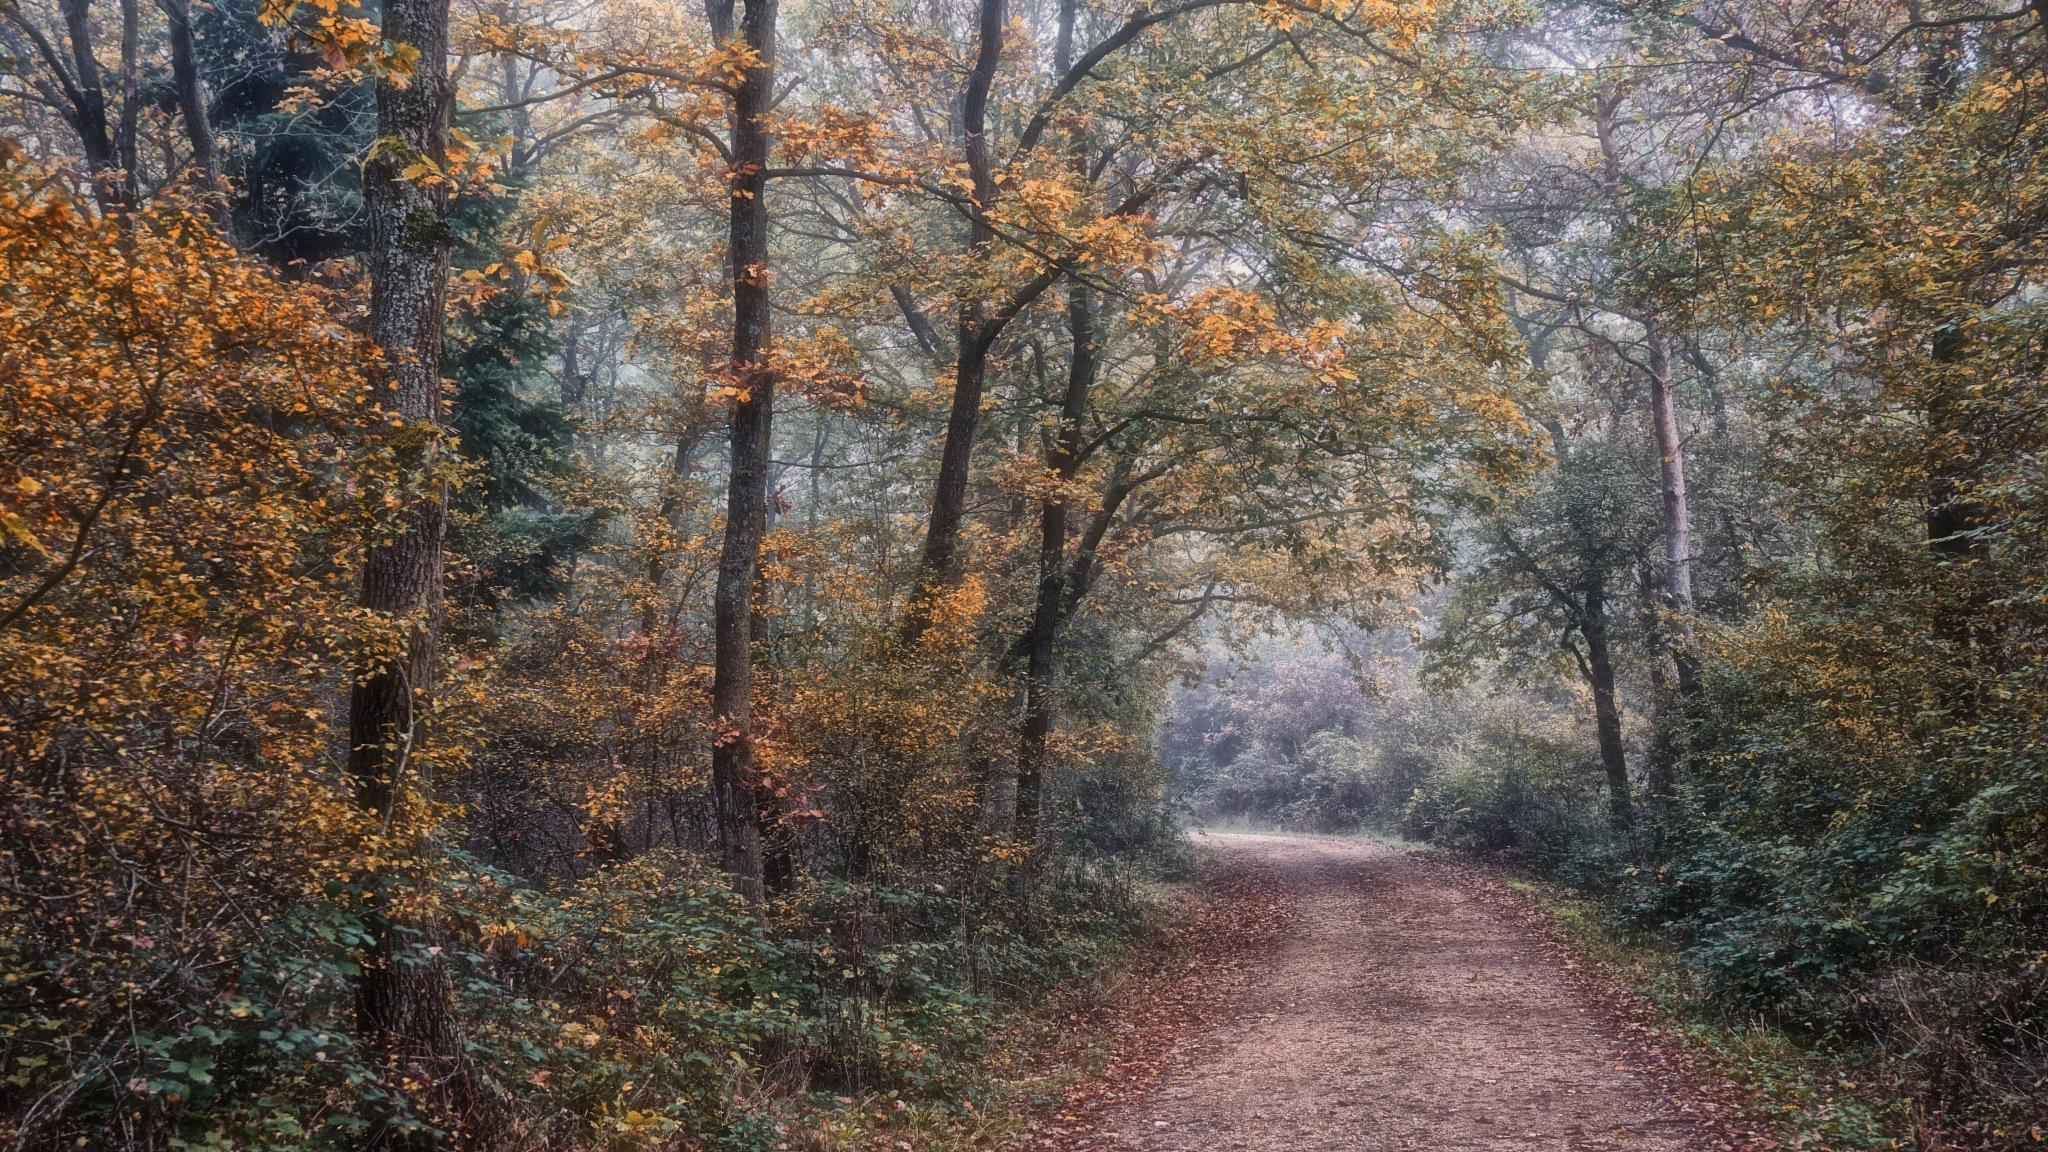 Foggy autumn by Jerryrig